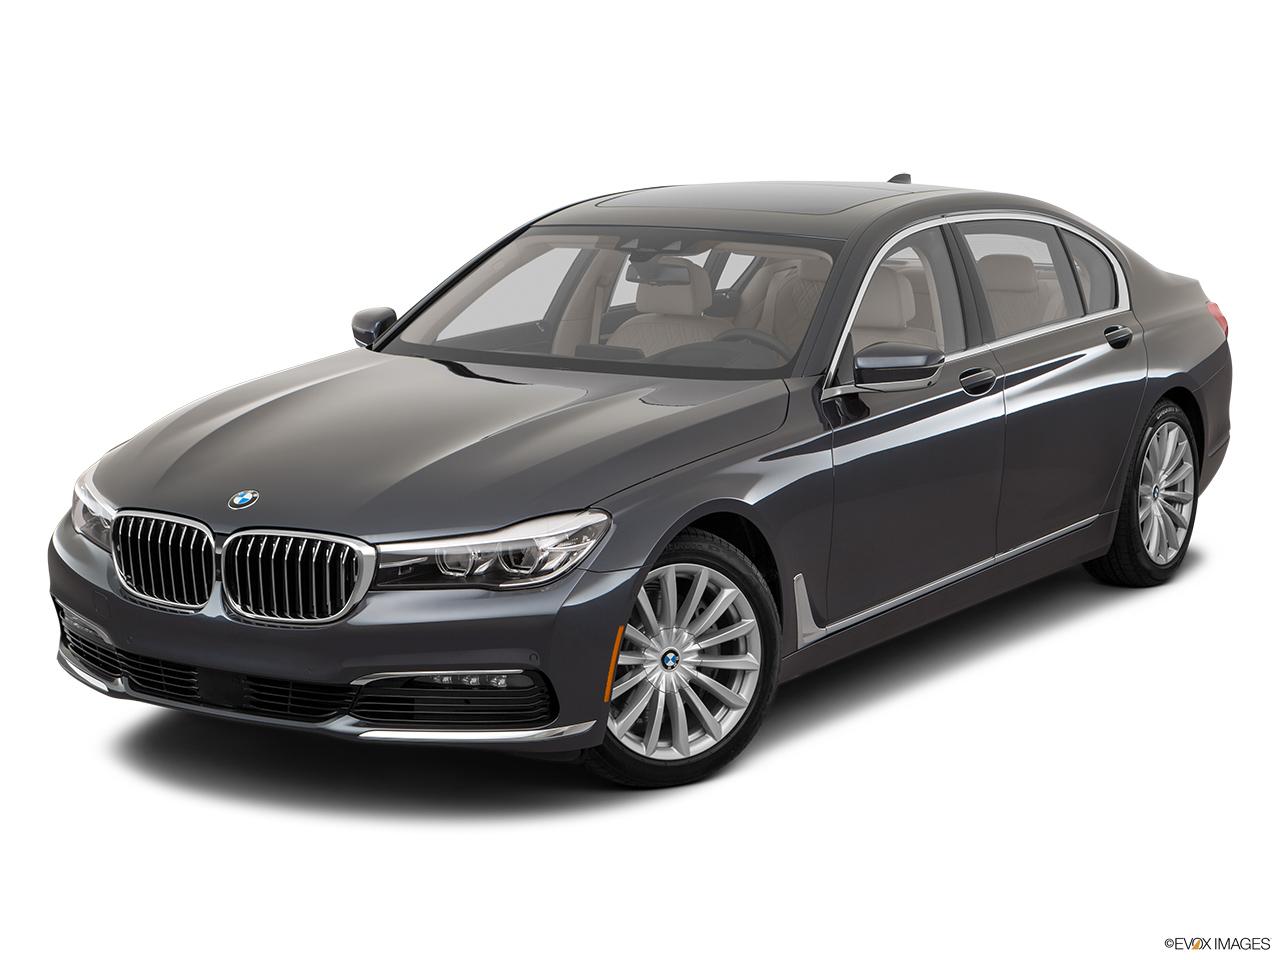 BMW 7 Series 2017 740Li United Arab Emirates Front Angle View